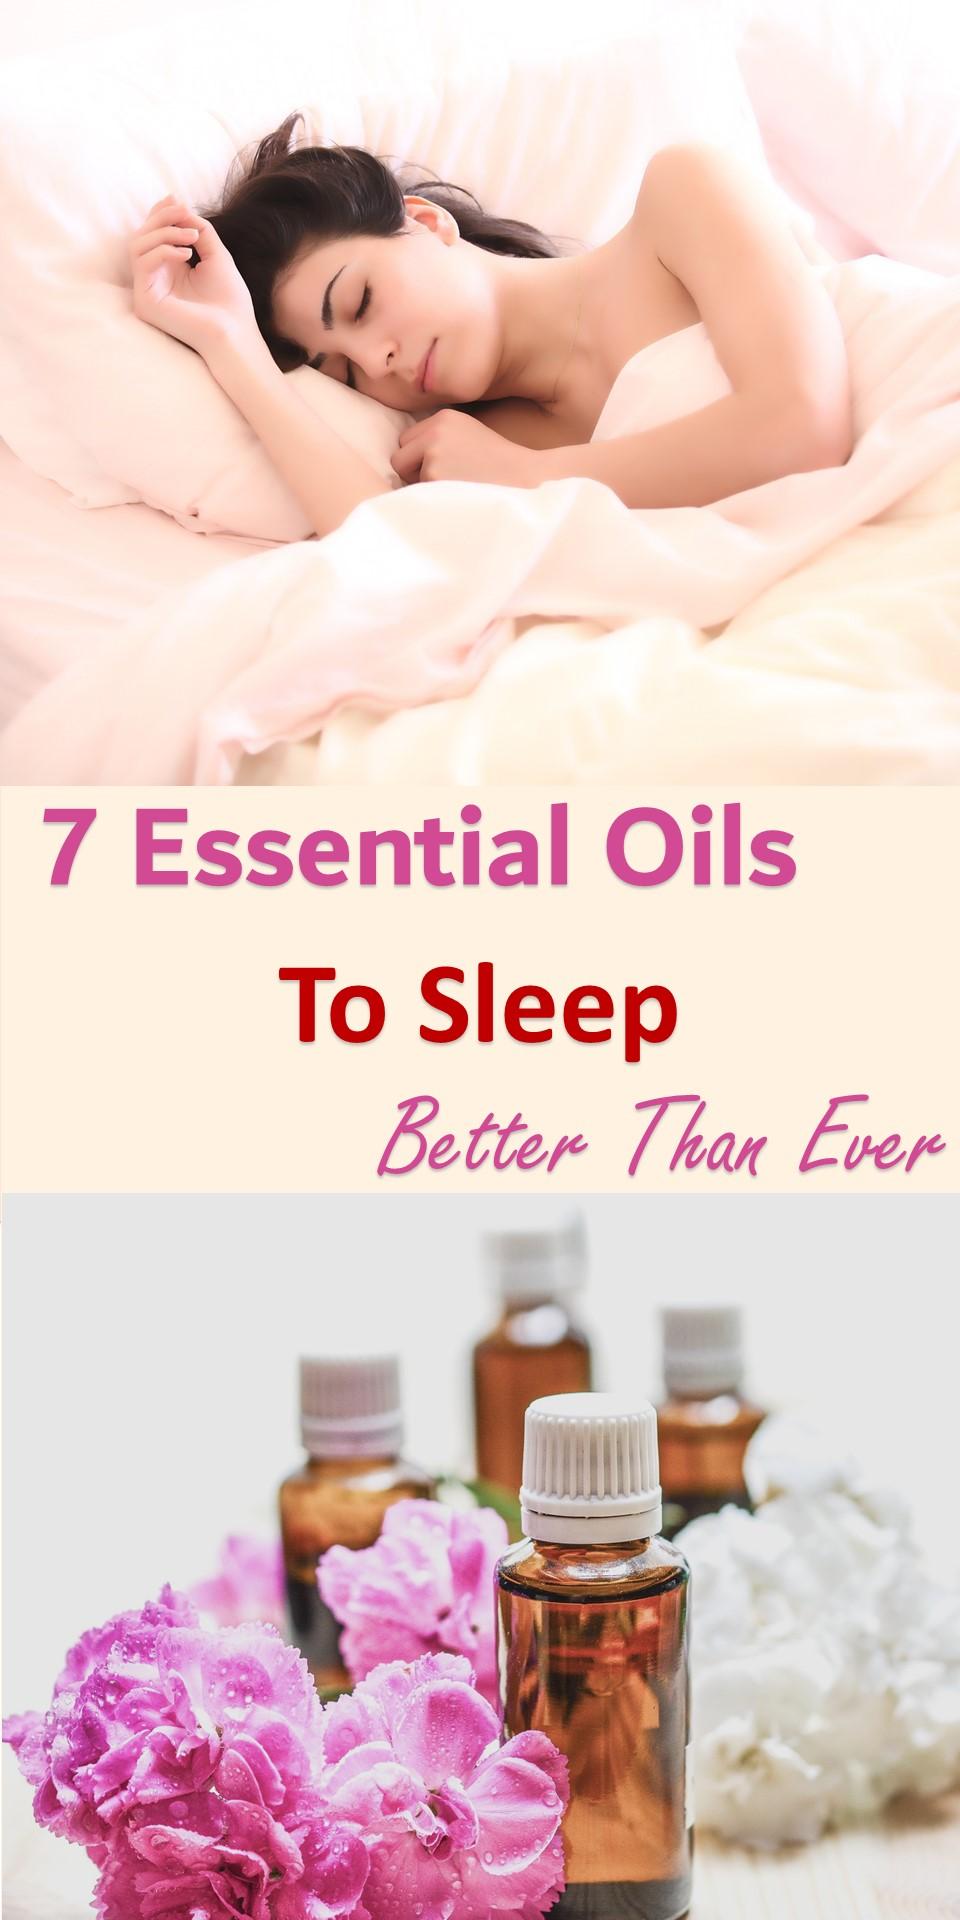 7 essential oils to sleep better